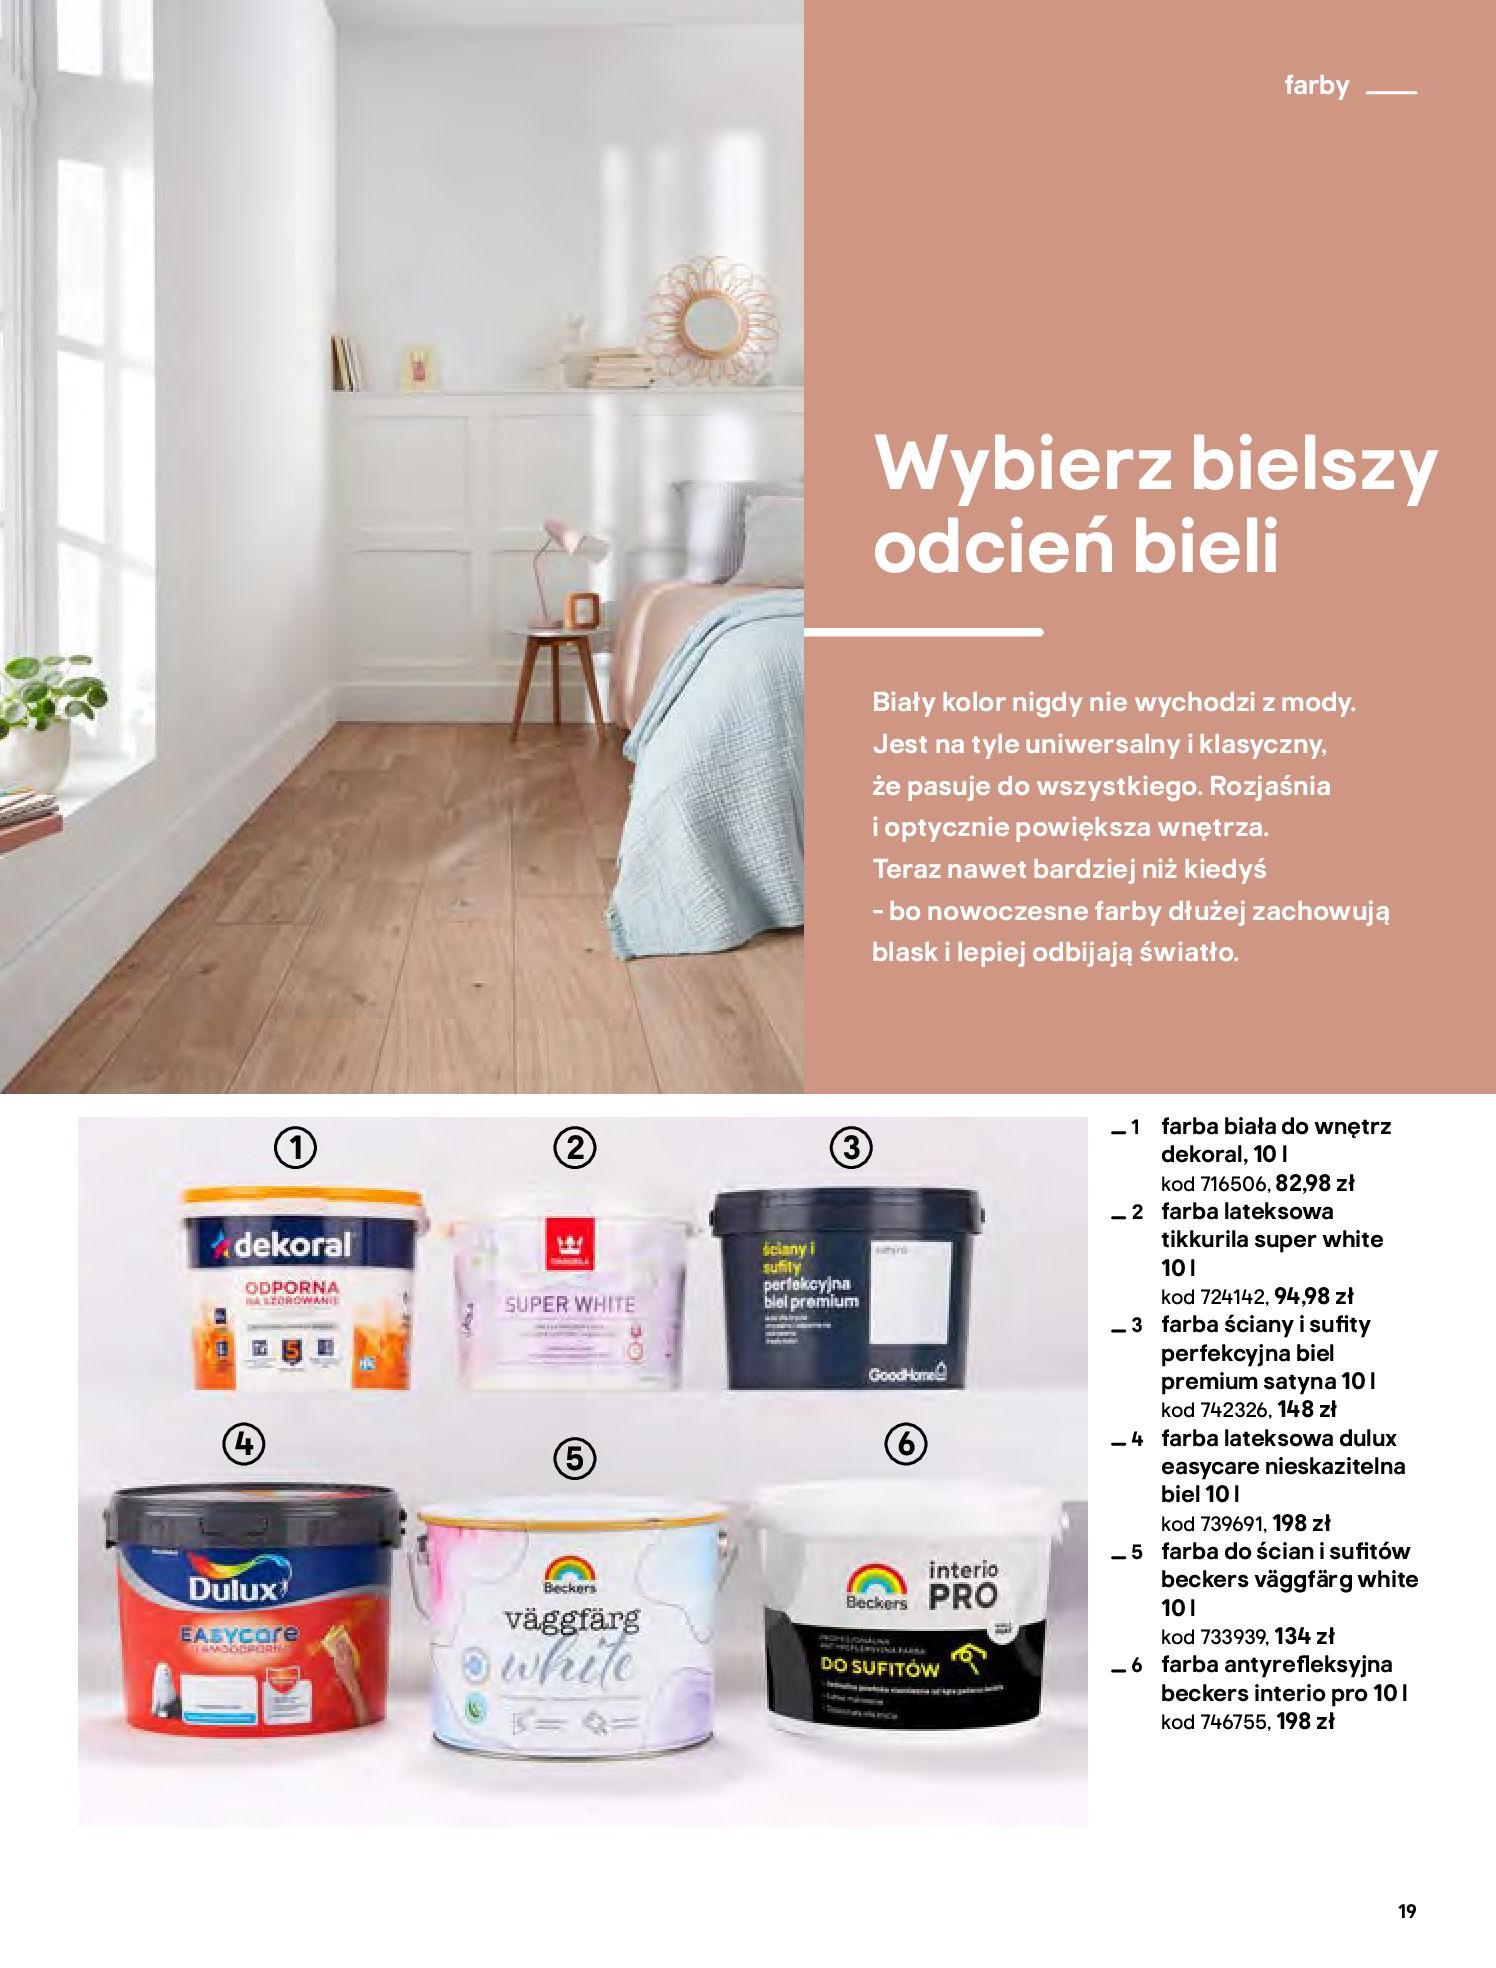 Gazetka Castorama - Katalog Dekoracje-22.10.2020-31.12.2020-page-19